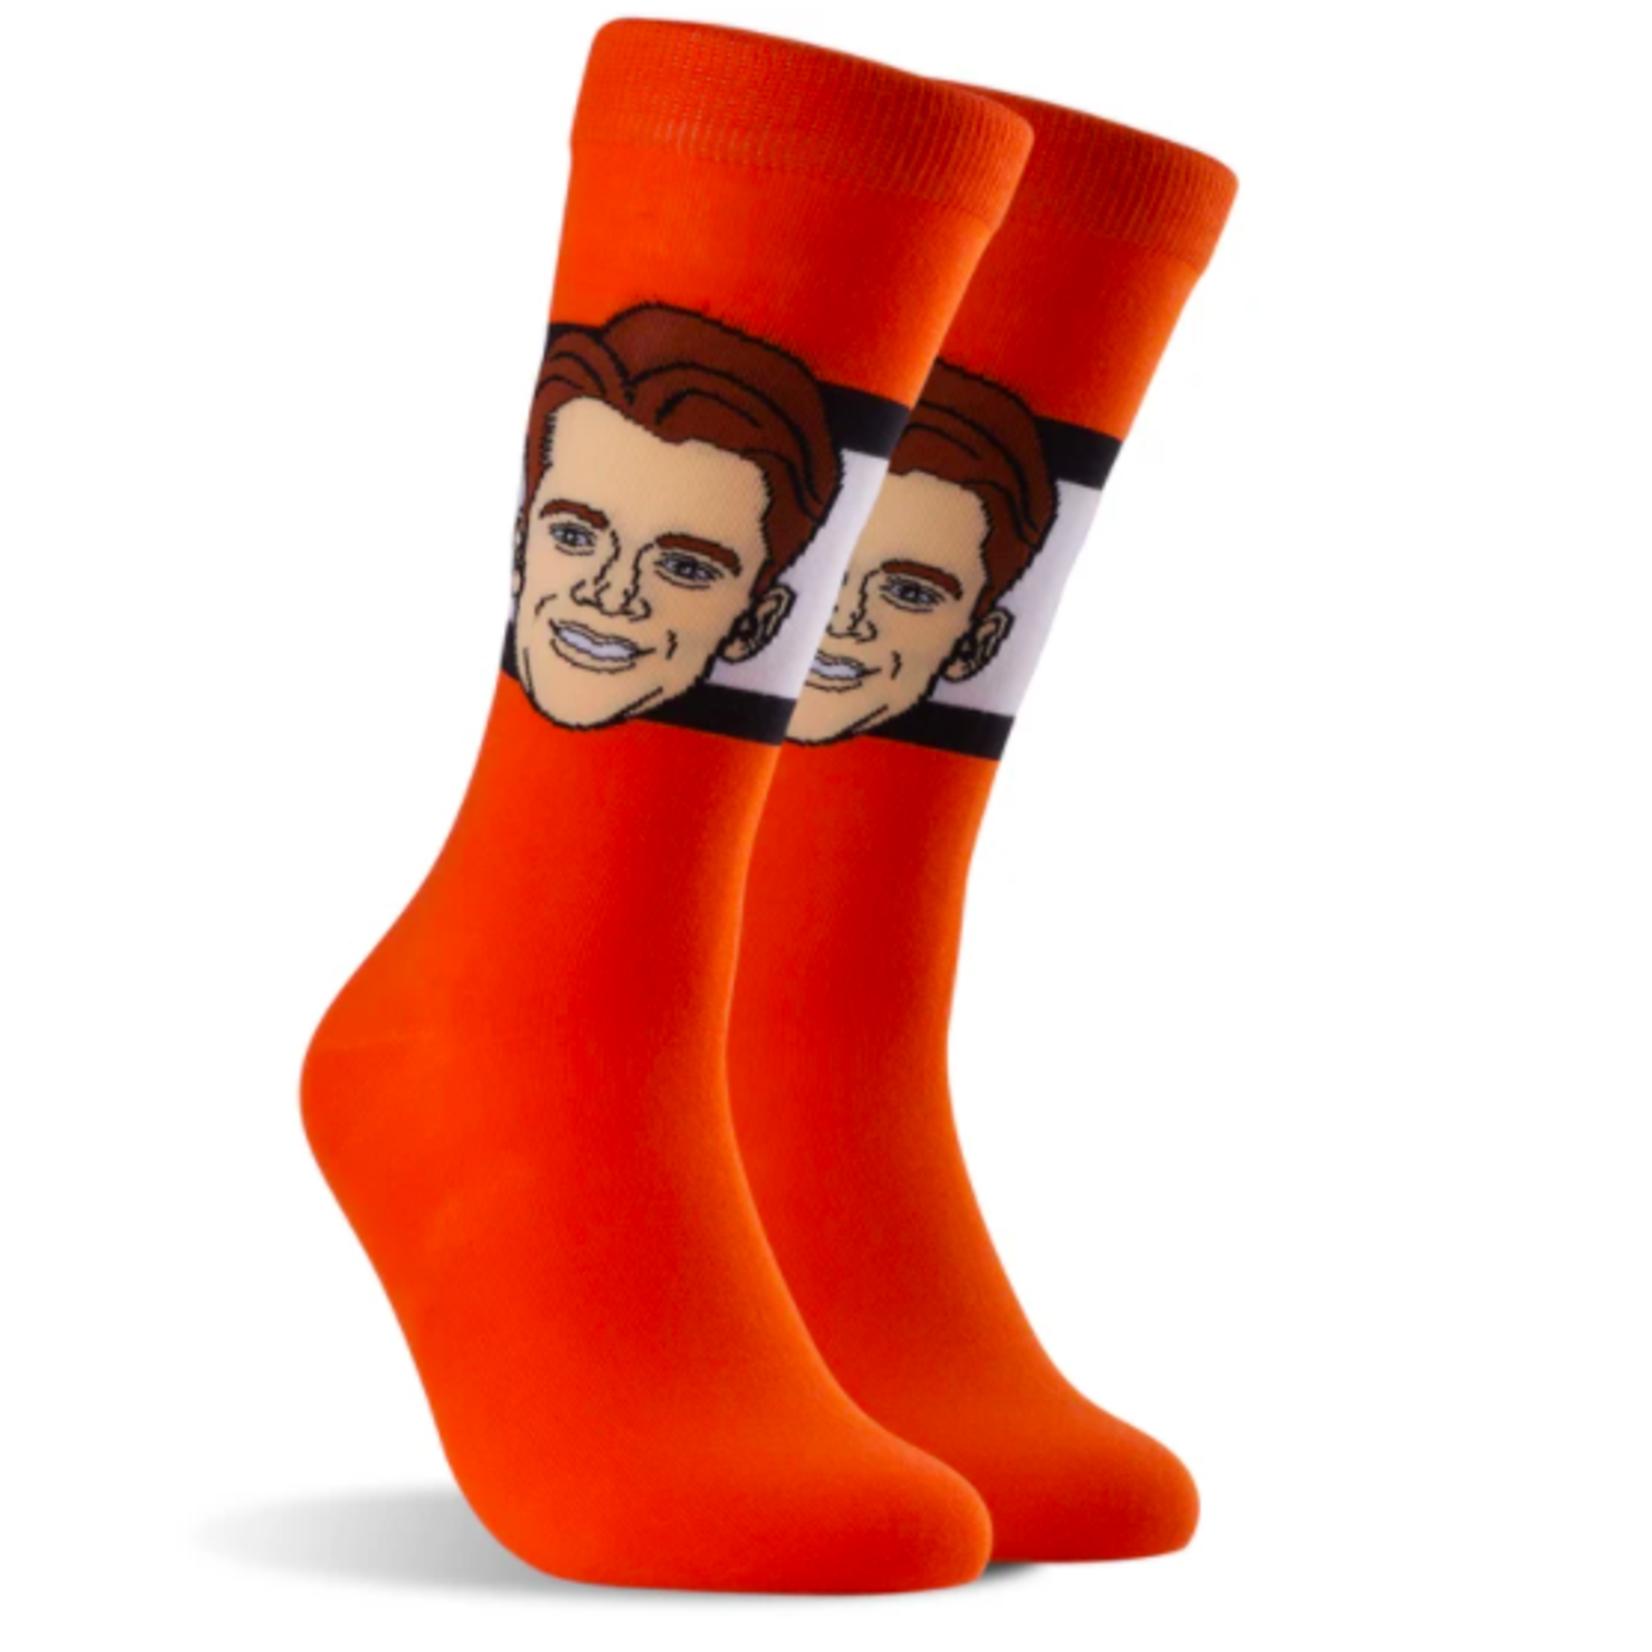 Major League Socks - Carter Hart